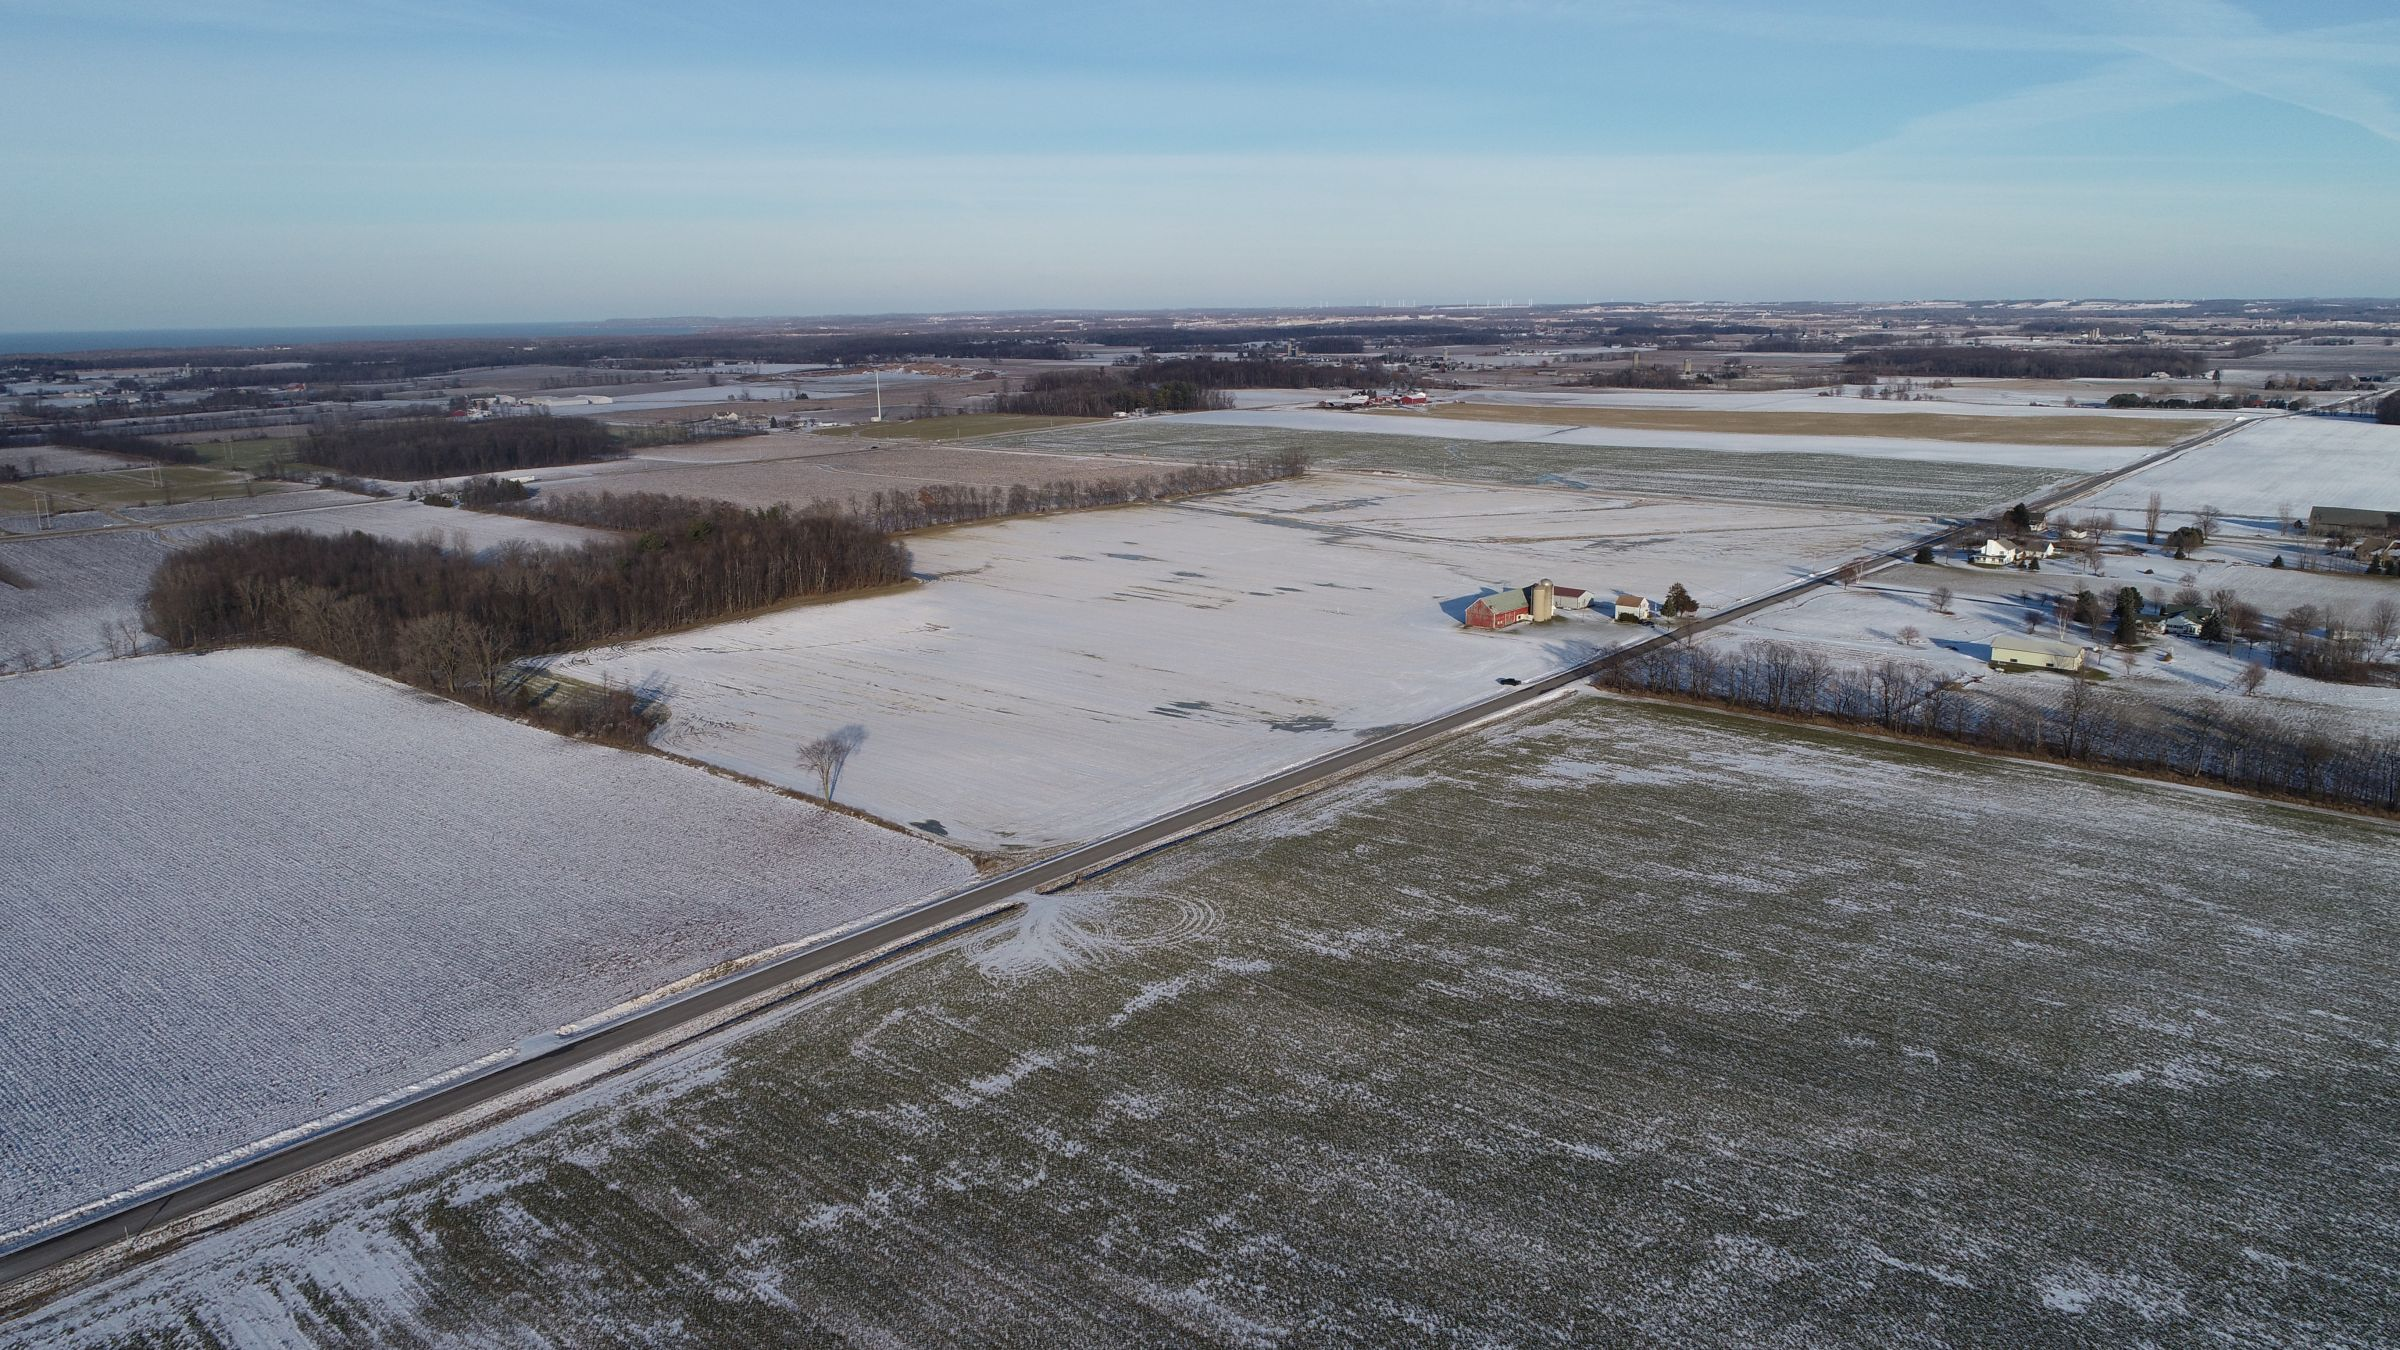 Aerial Image - Northwest looking Southeast